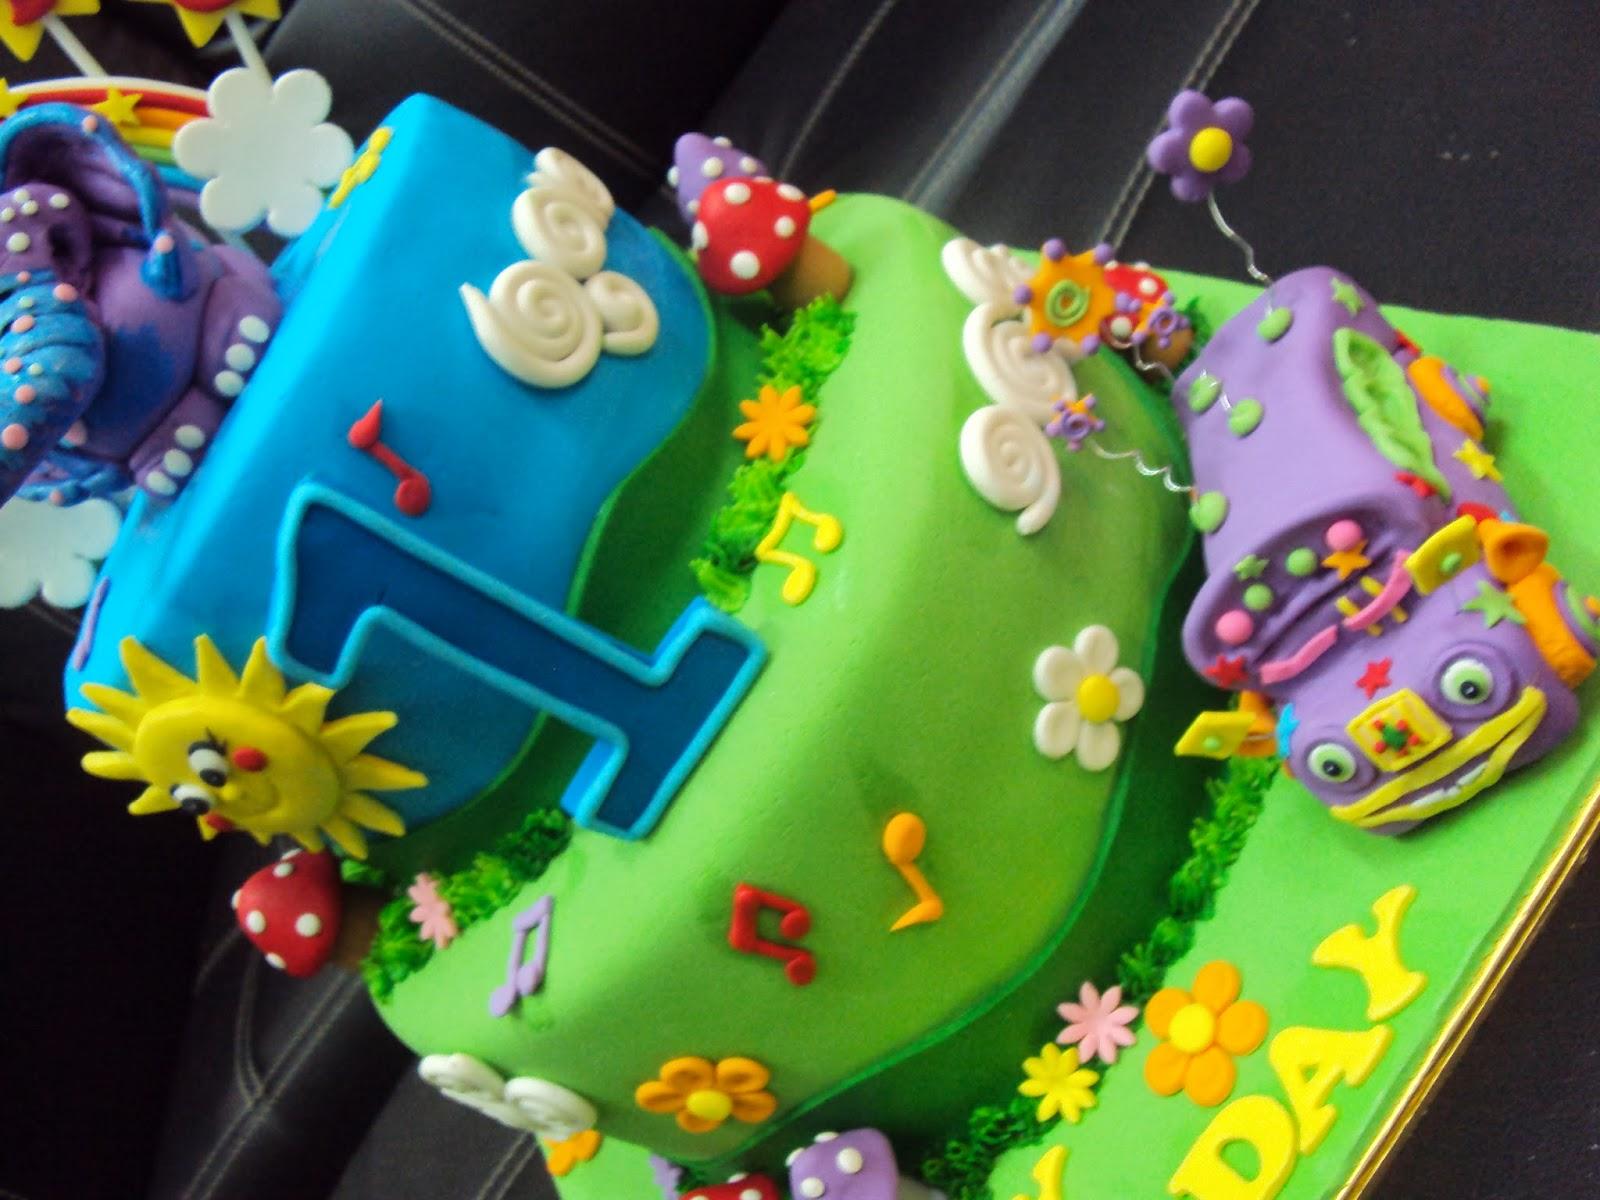 Gigglebellies Cake Decorations